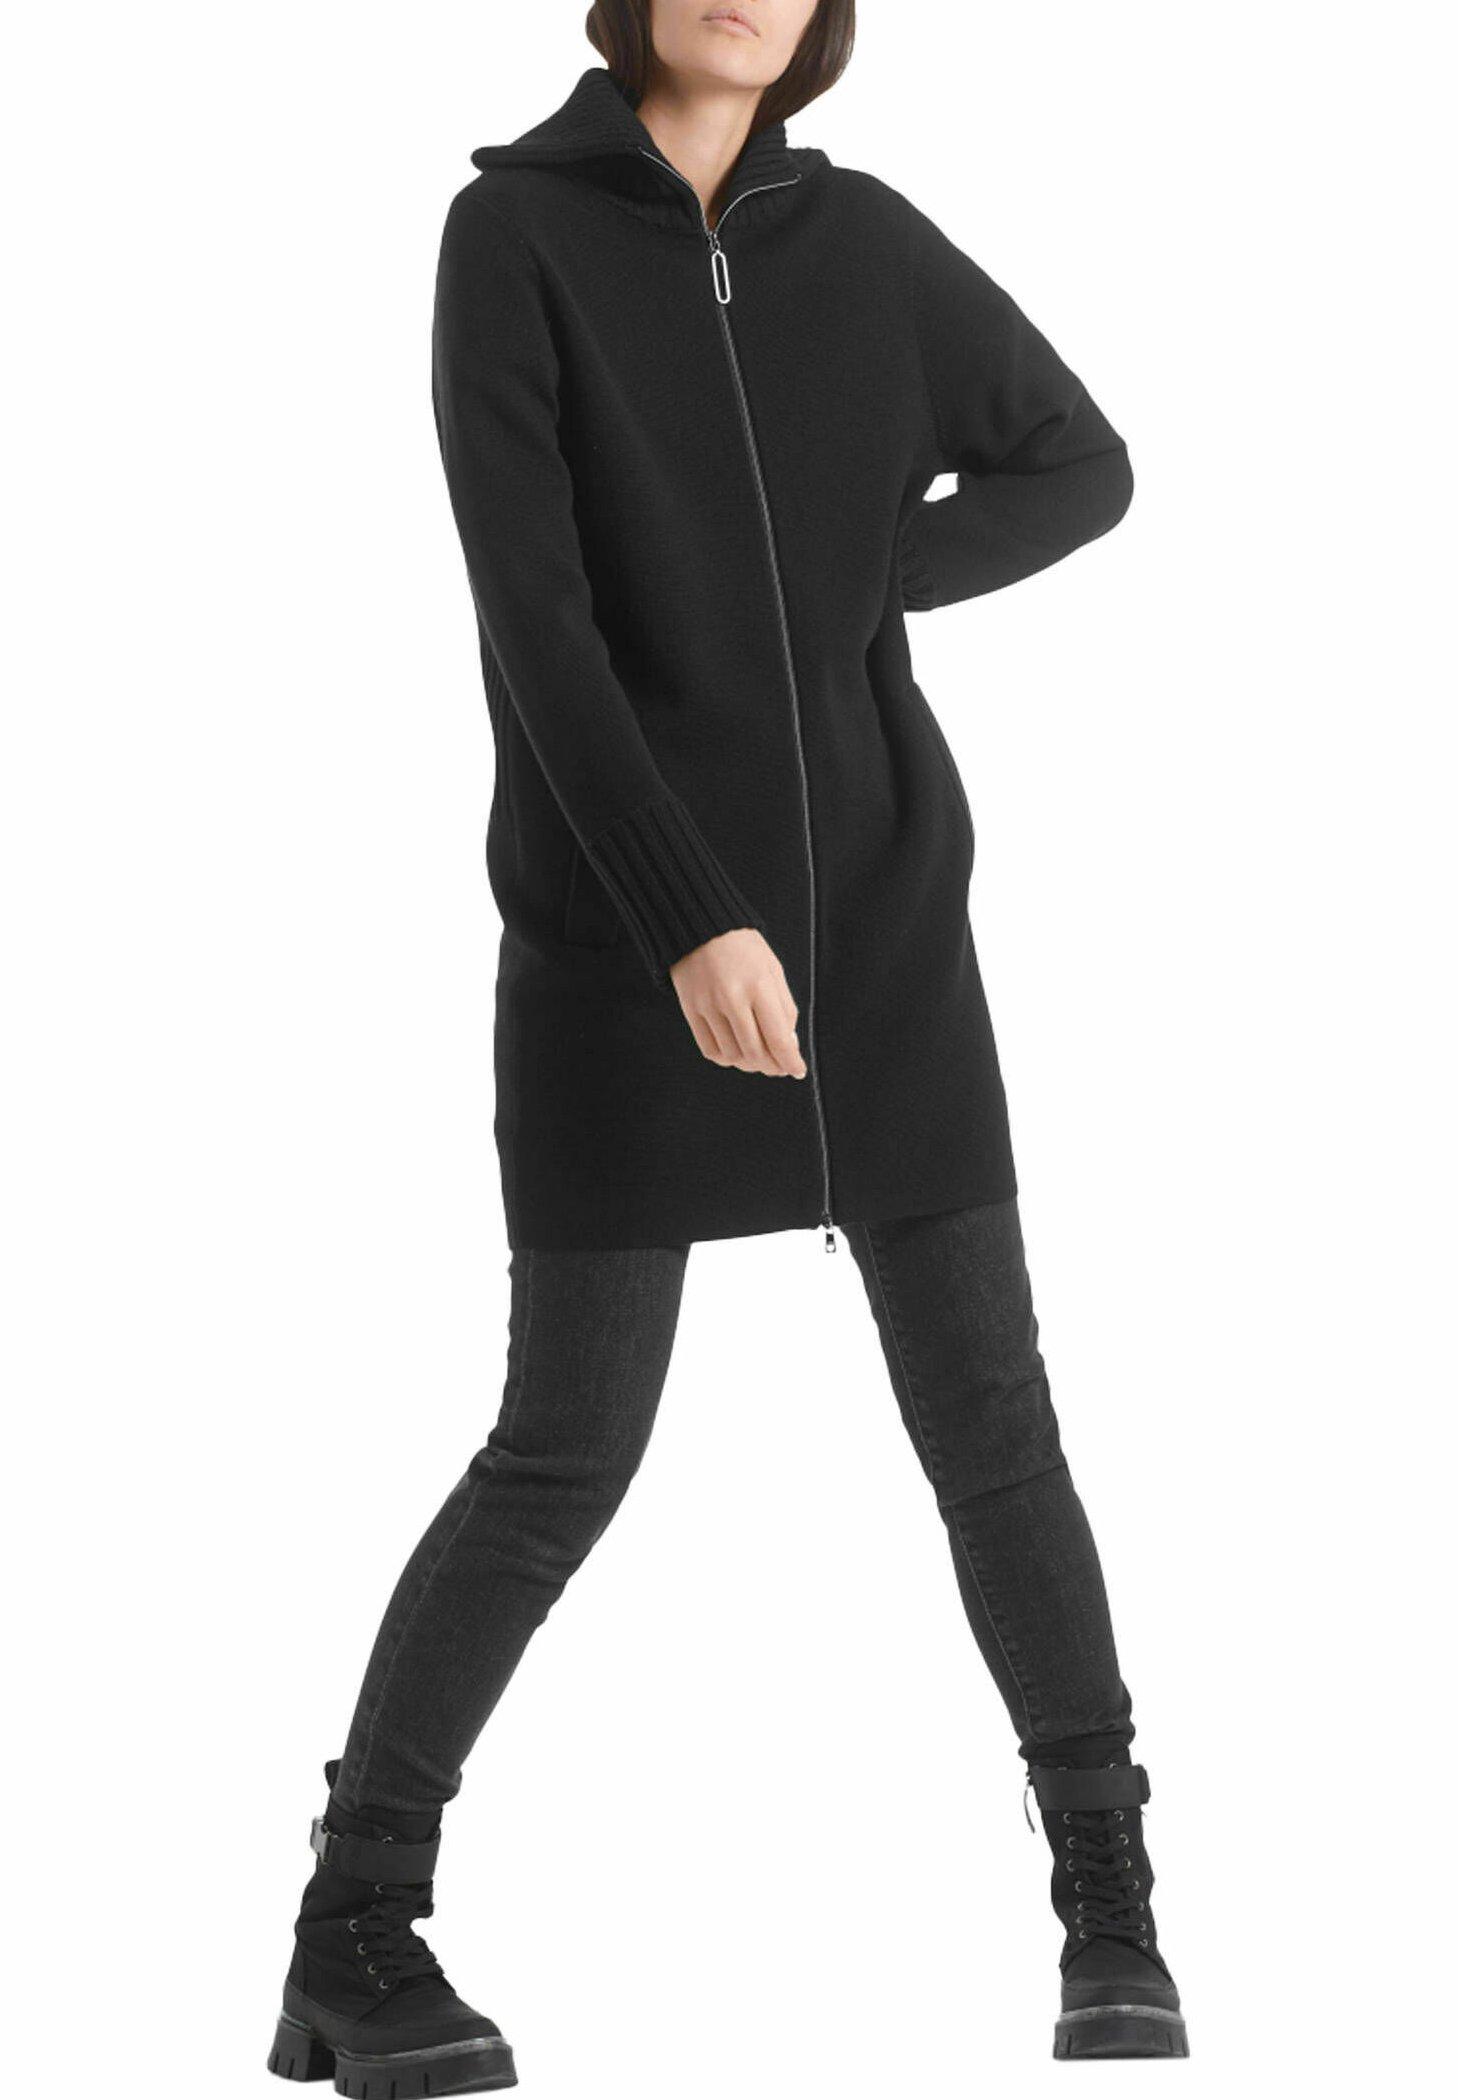 Damen Strickjacke - schwarz